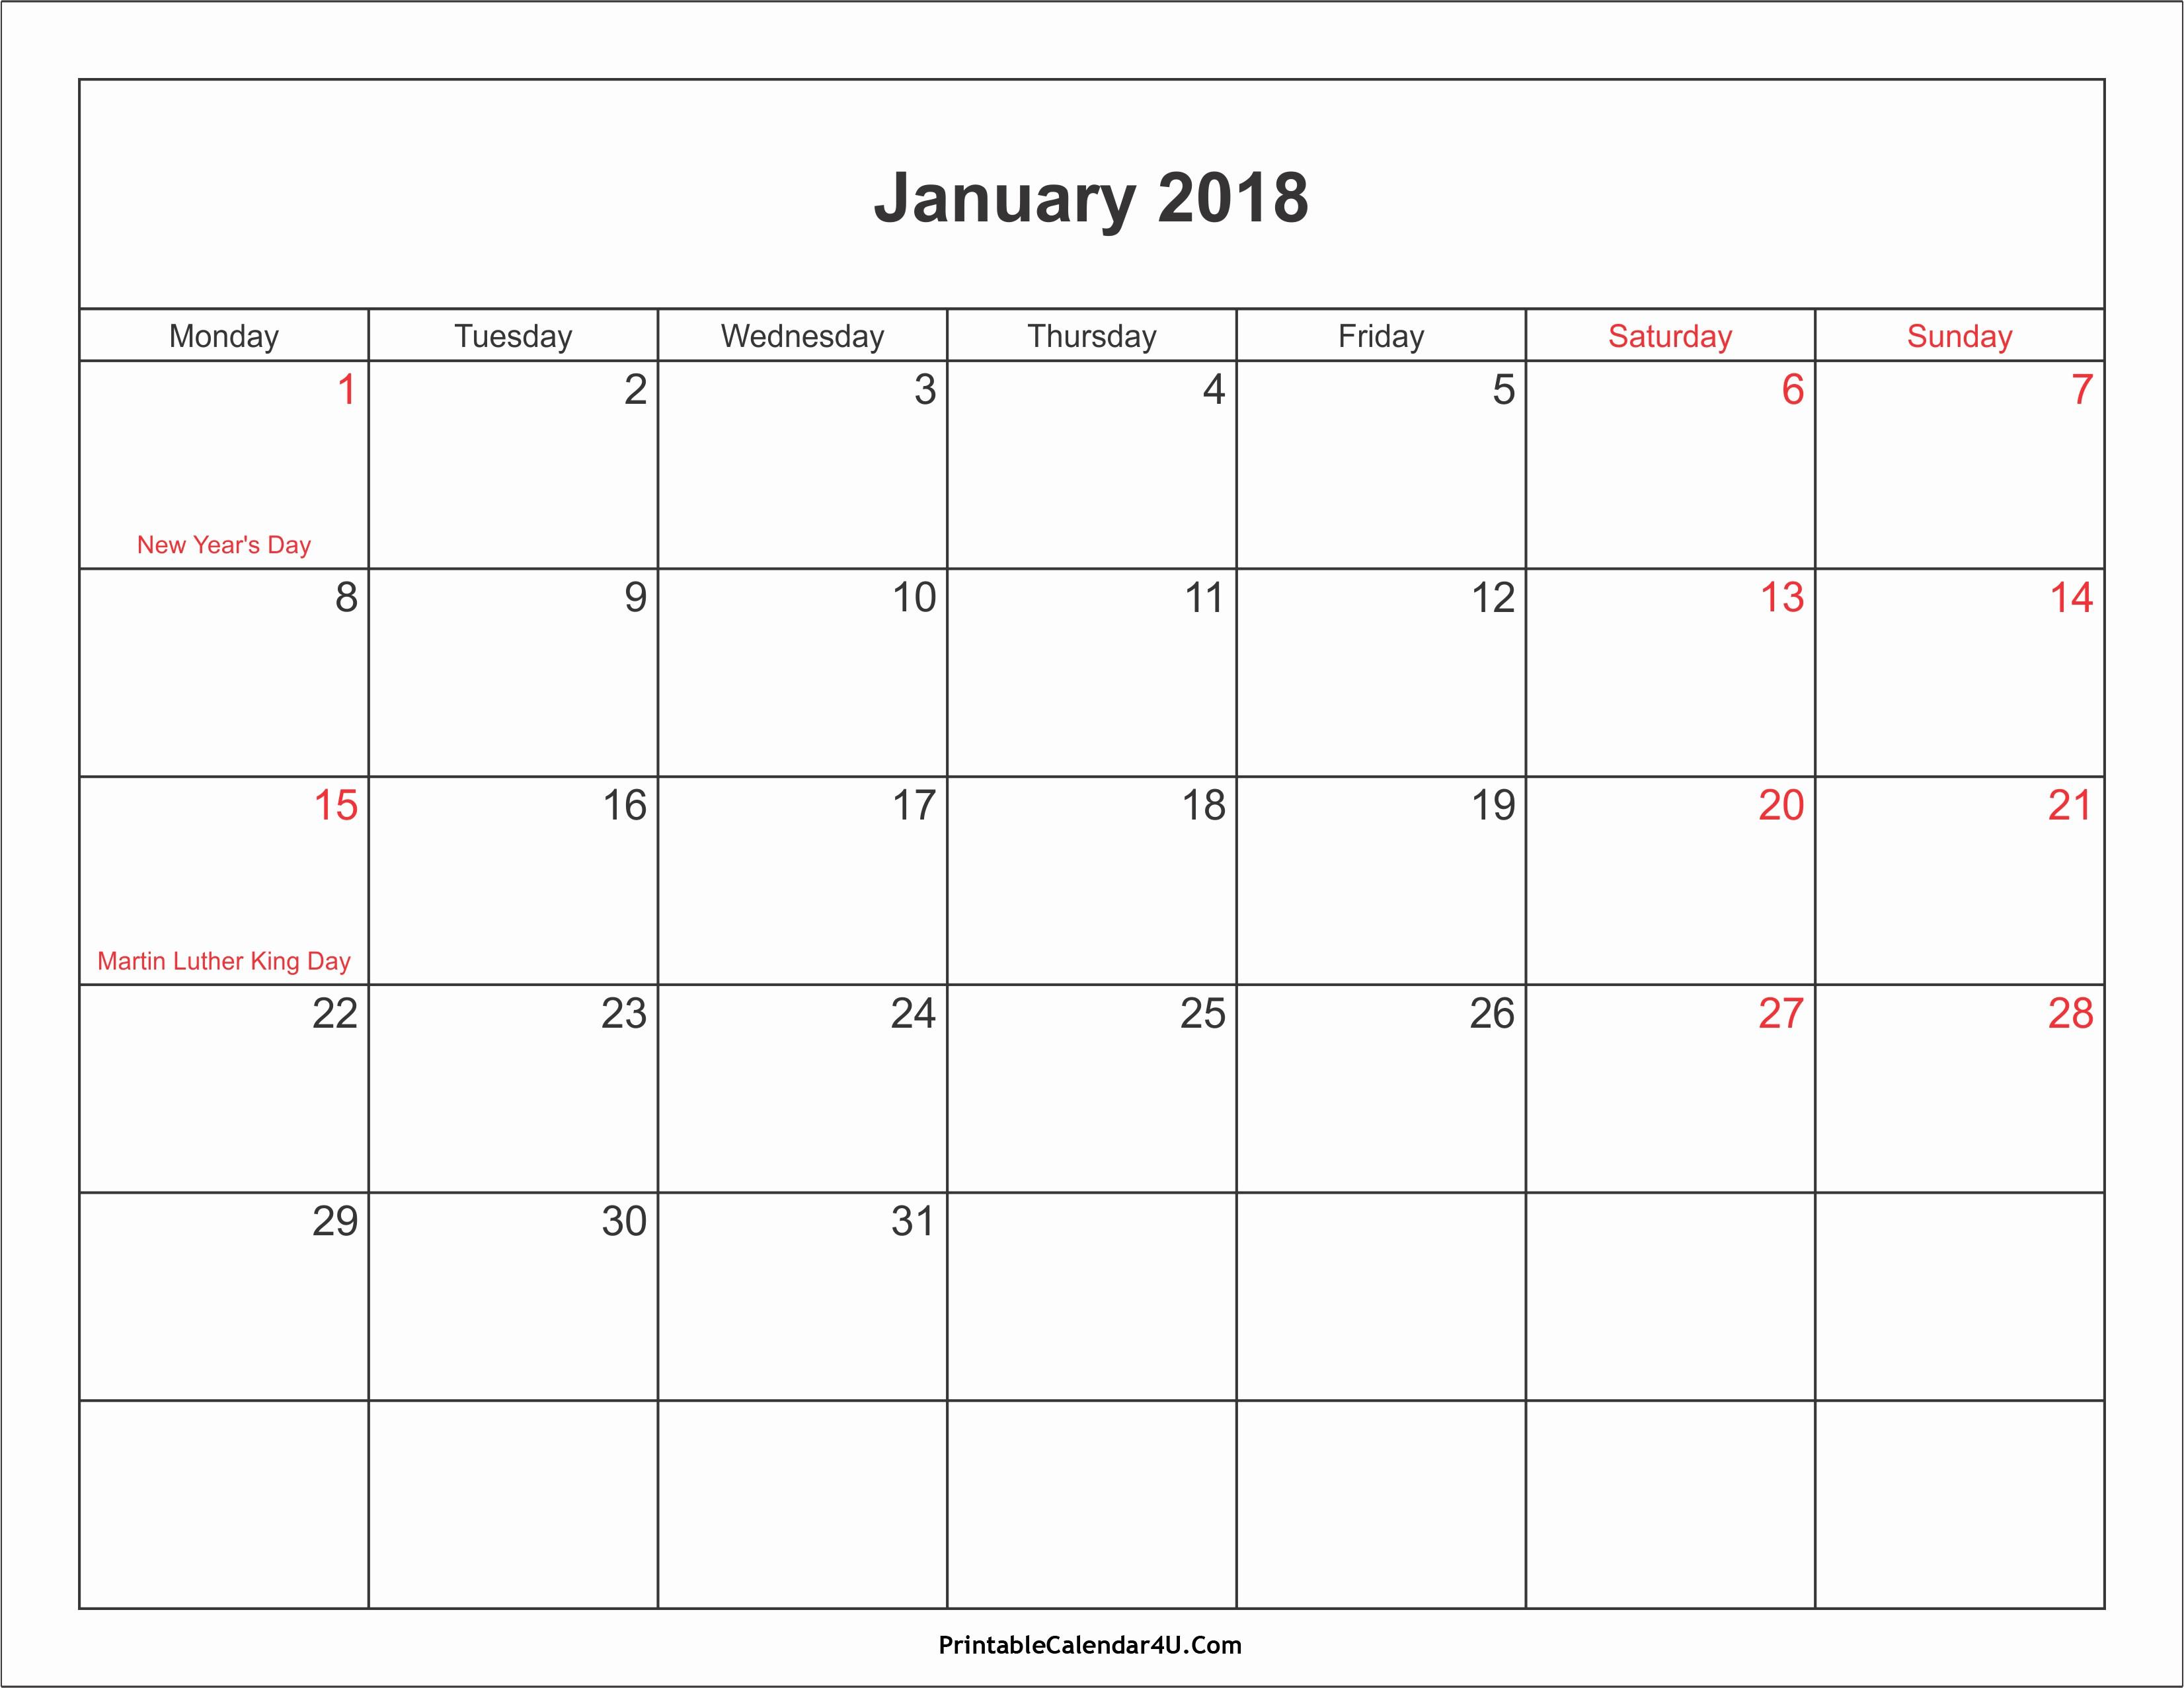 Free 2018 Monthly Calendar Template New January 2018 Calendar Pdf